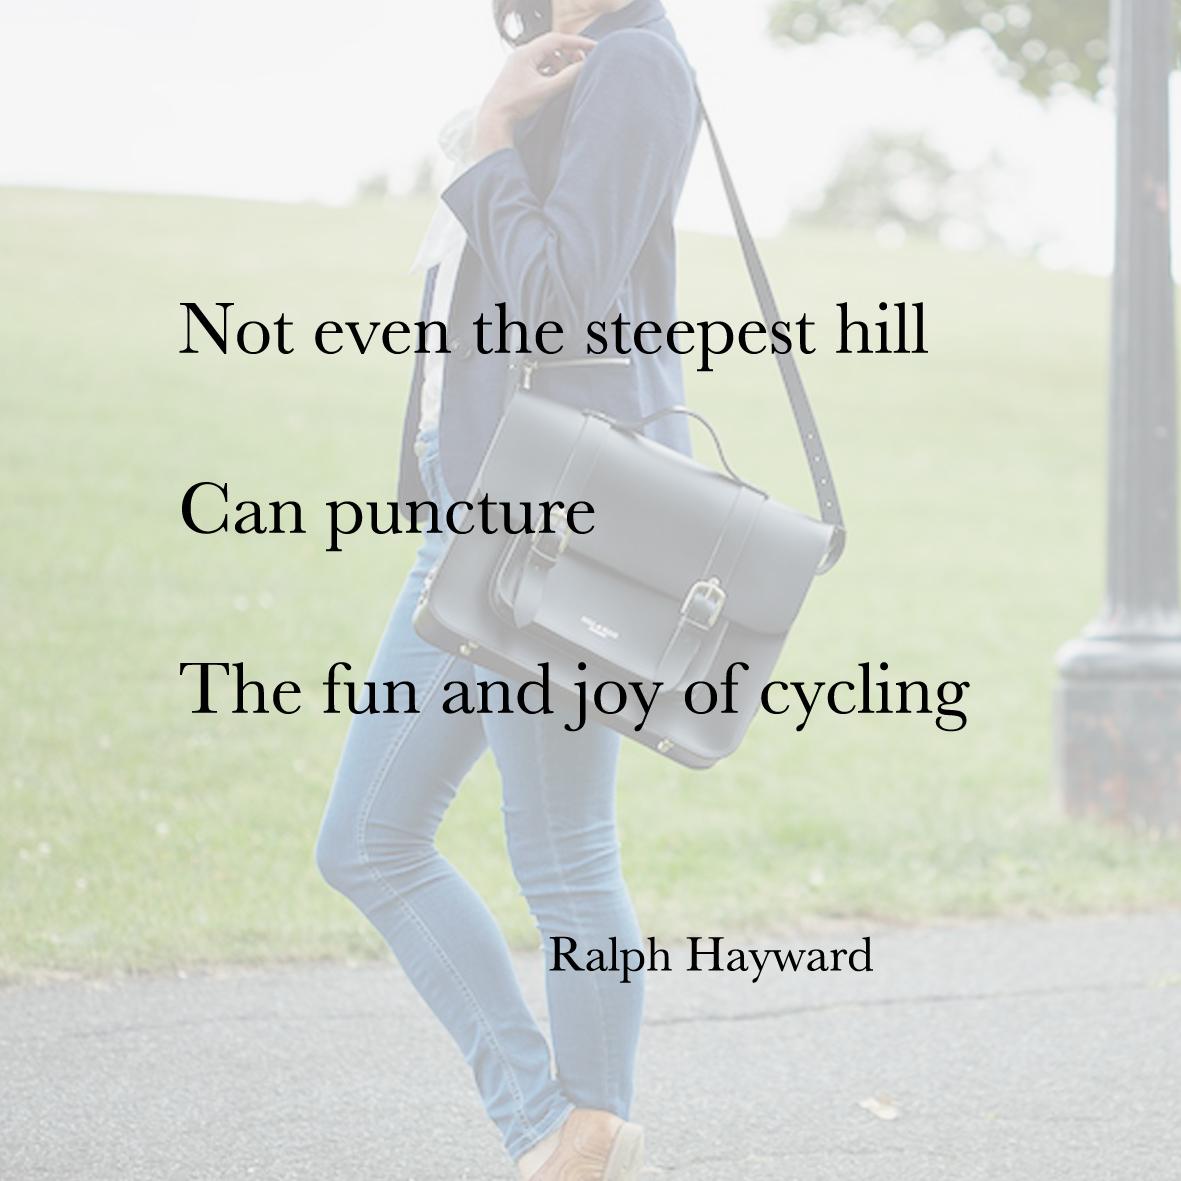 Baiku bike bag poetry ralph hayward